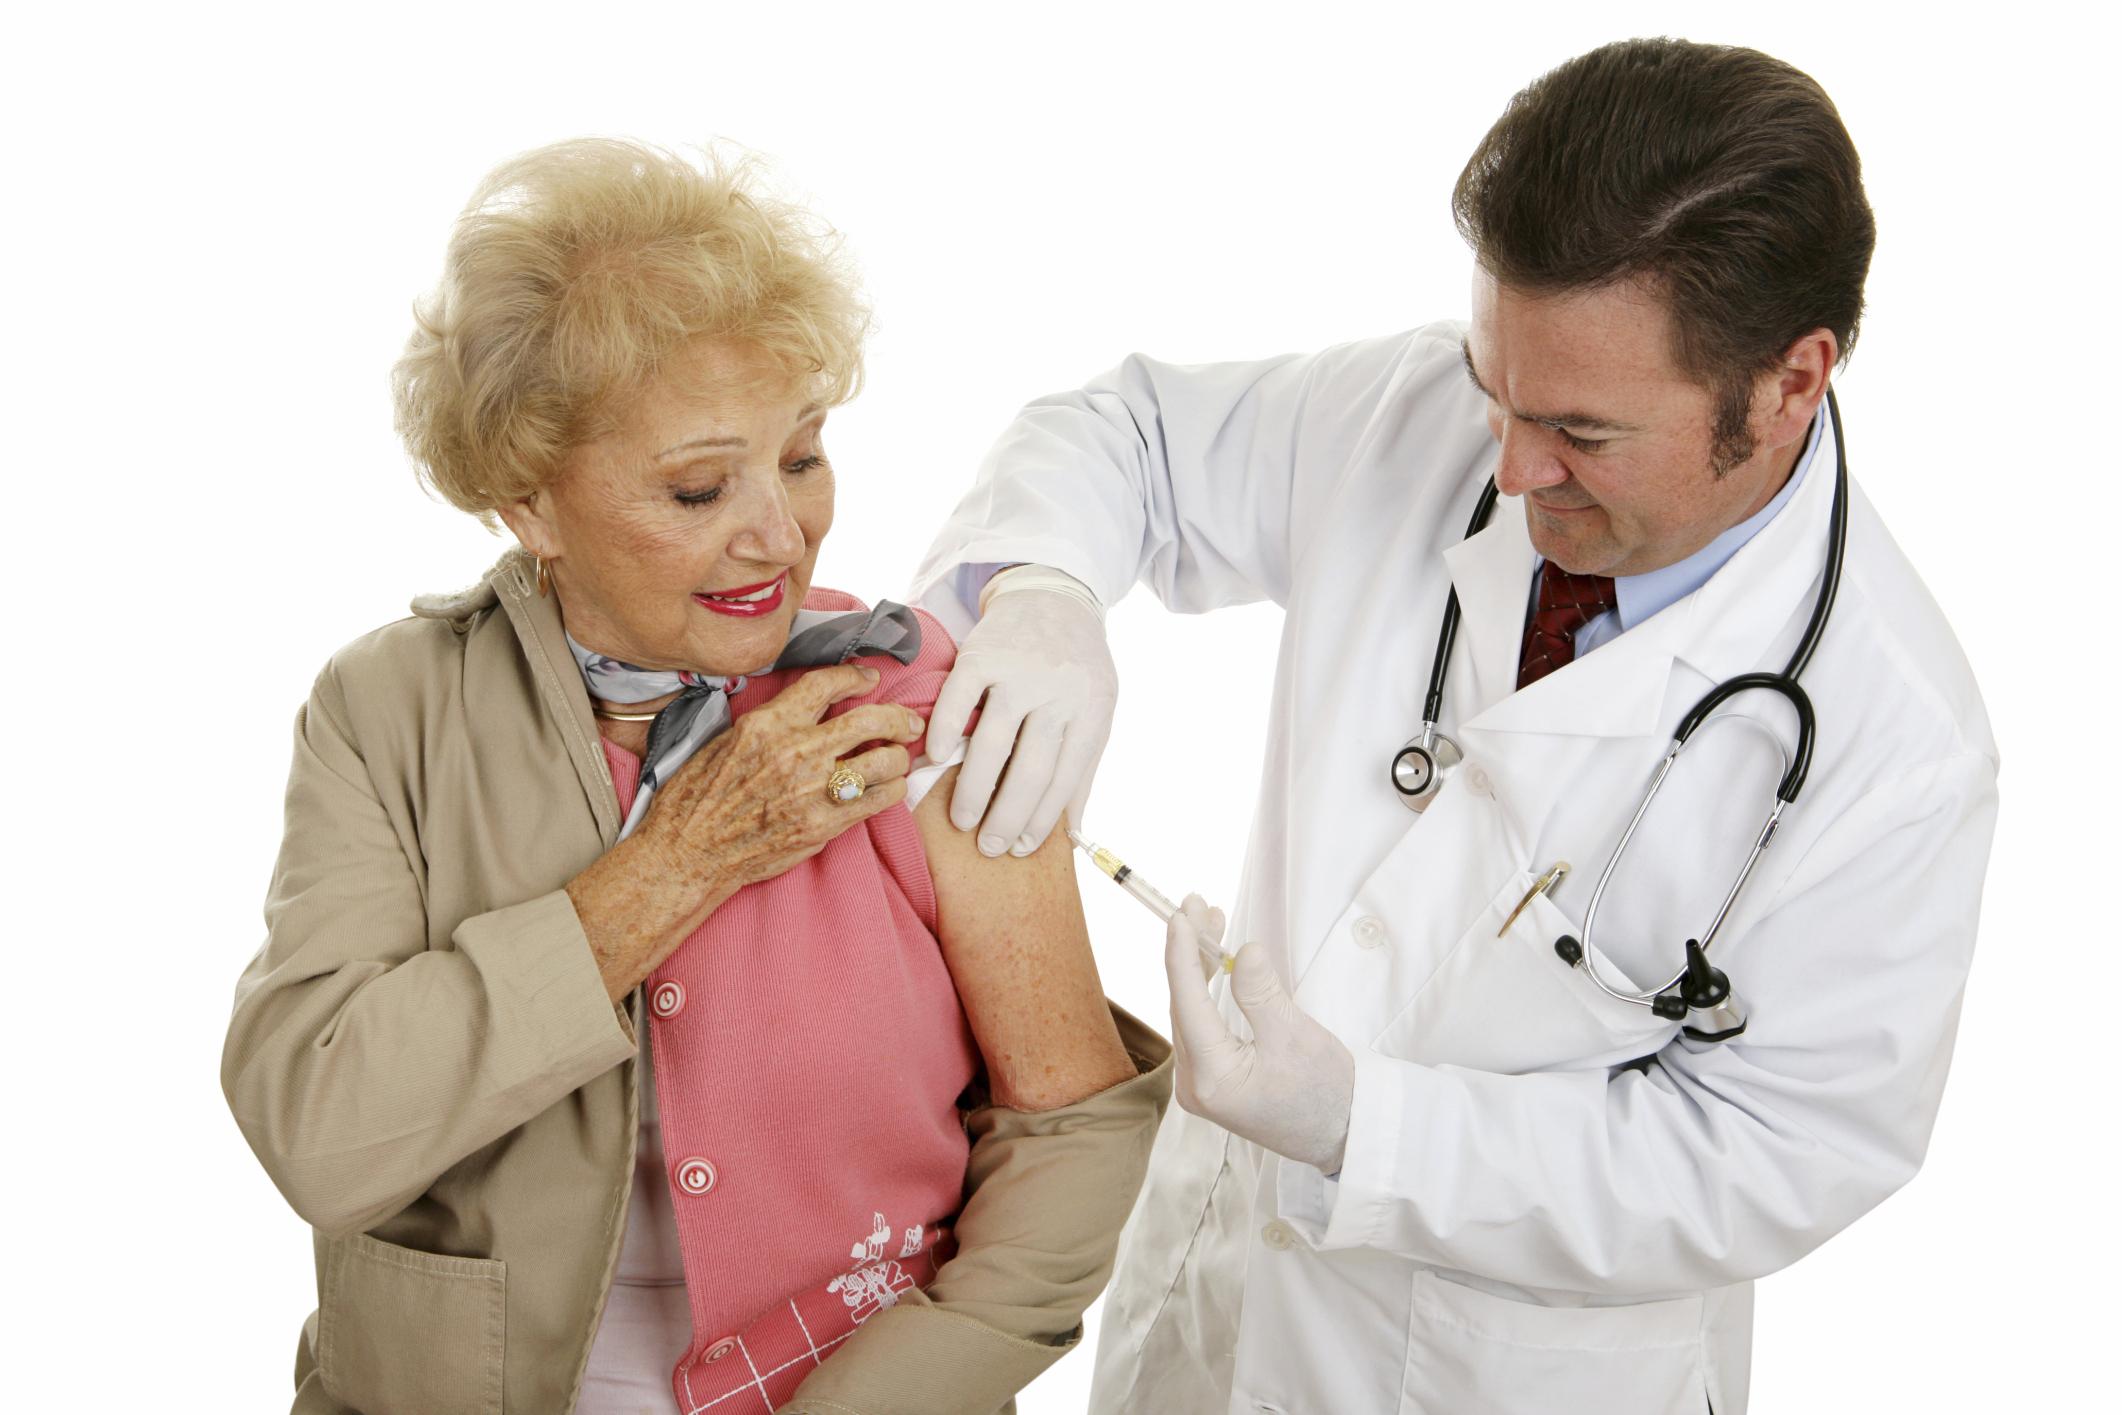 cdc flu vaccine and steroids